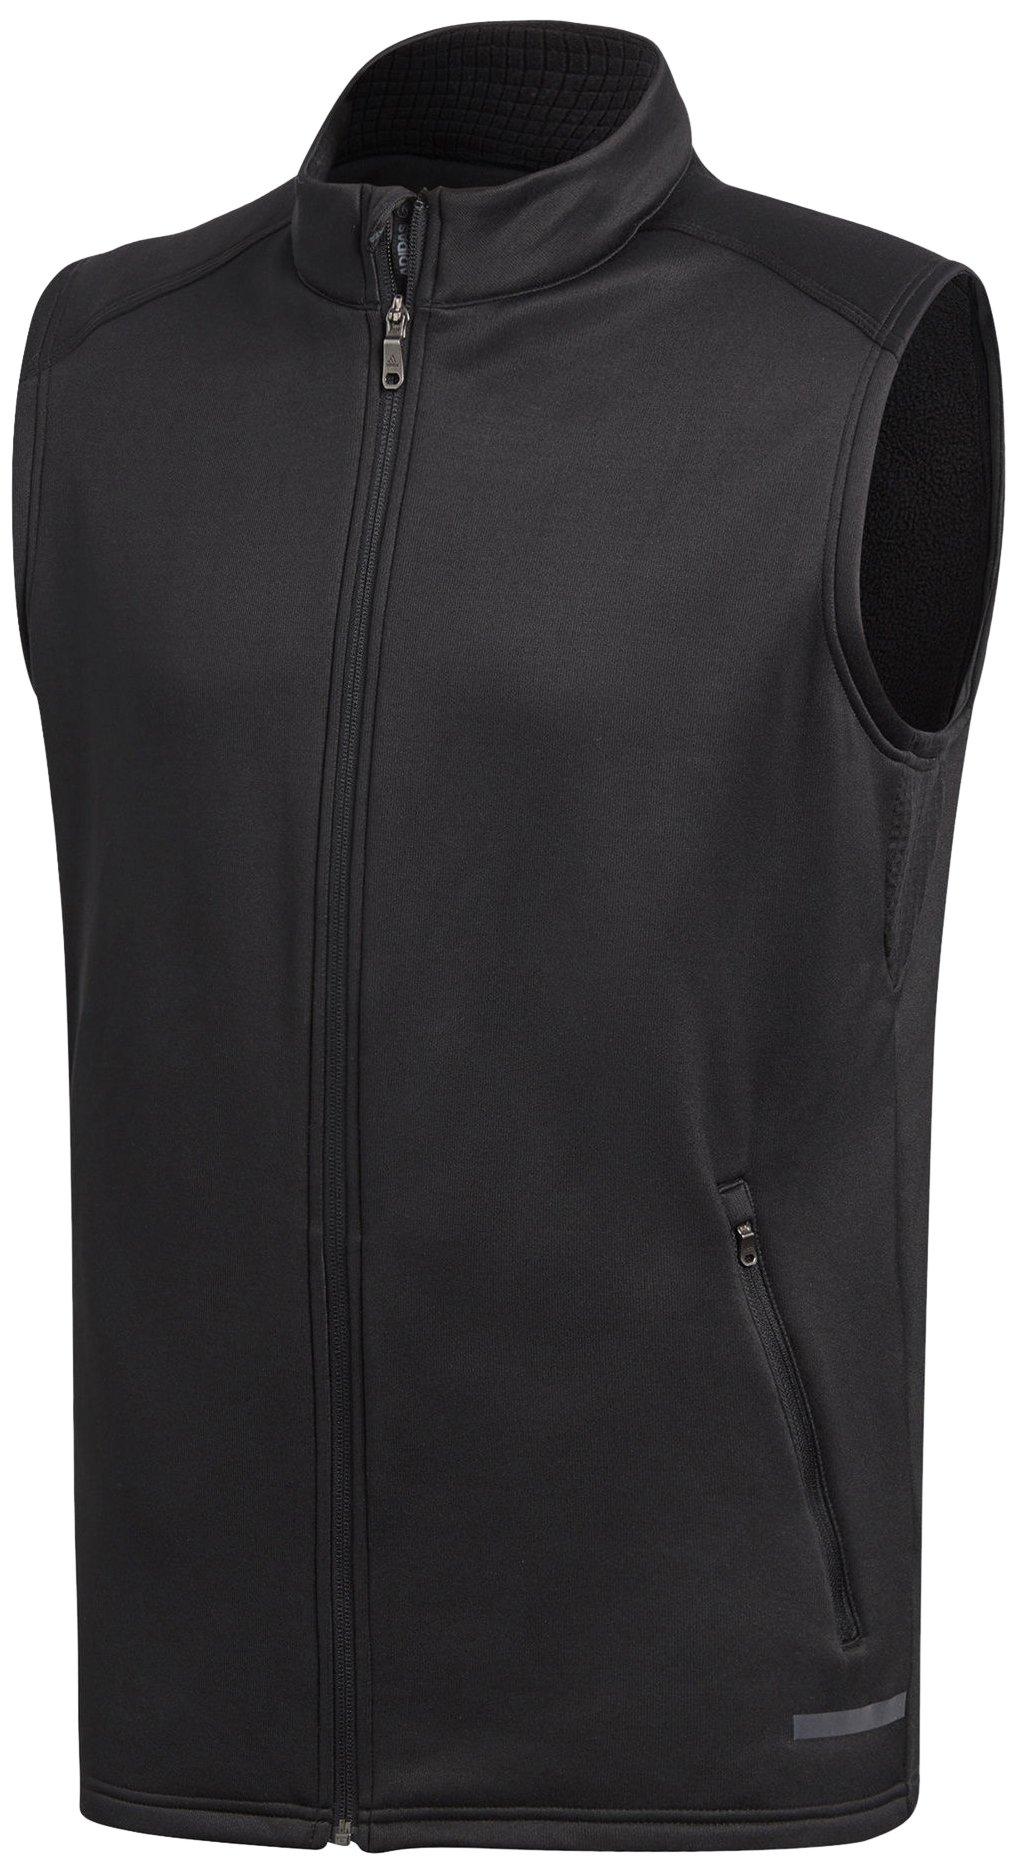 adidas Golf 2017 Mens Thermal Climaheat Hybrid Full Zip Gilet Performance Vest Black Large